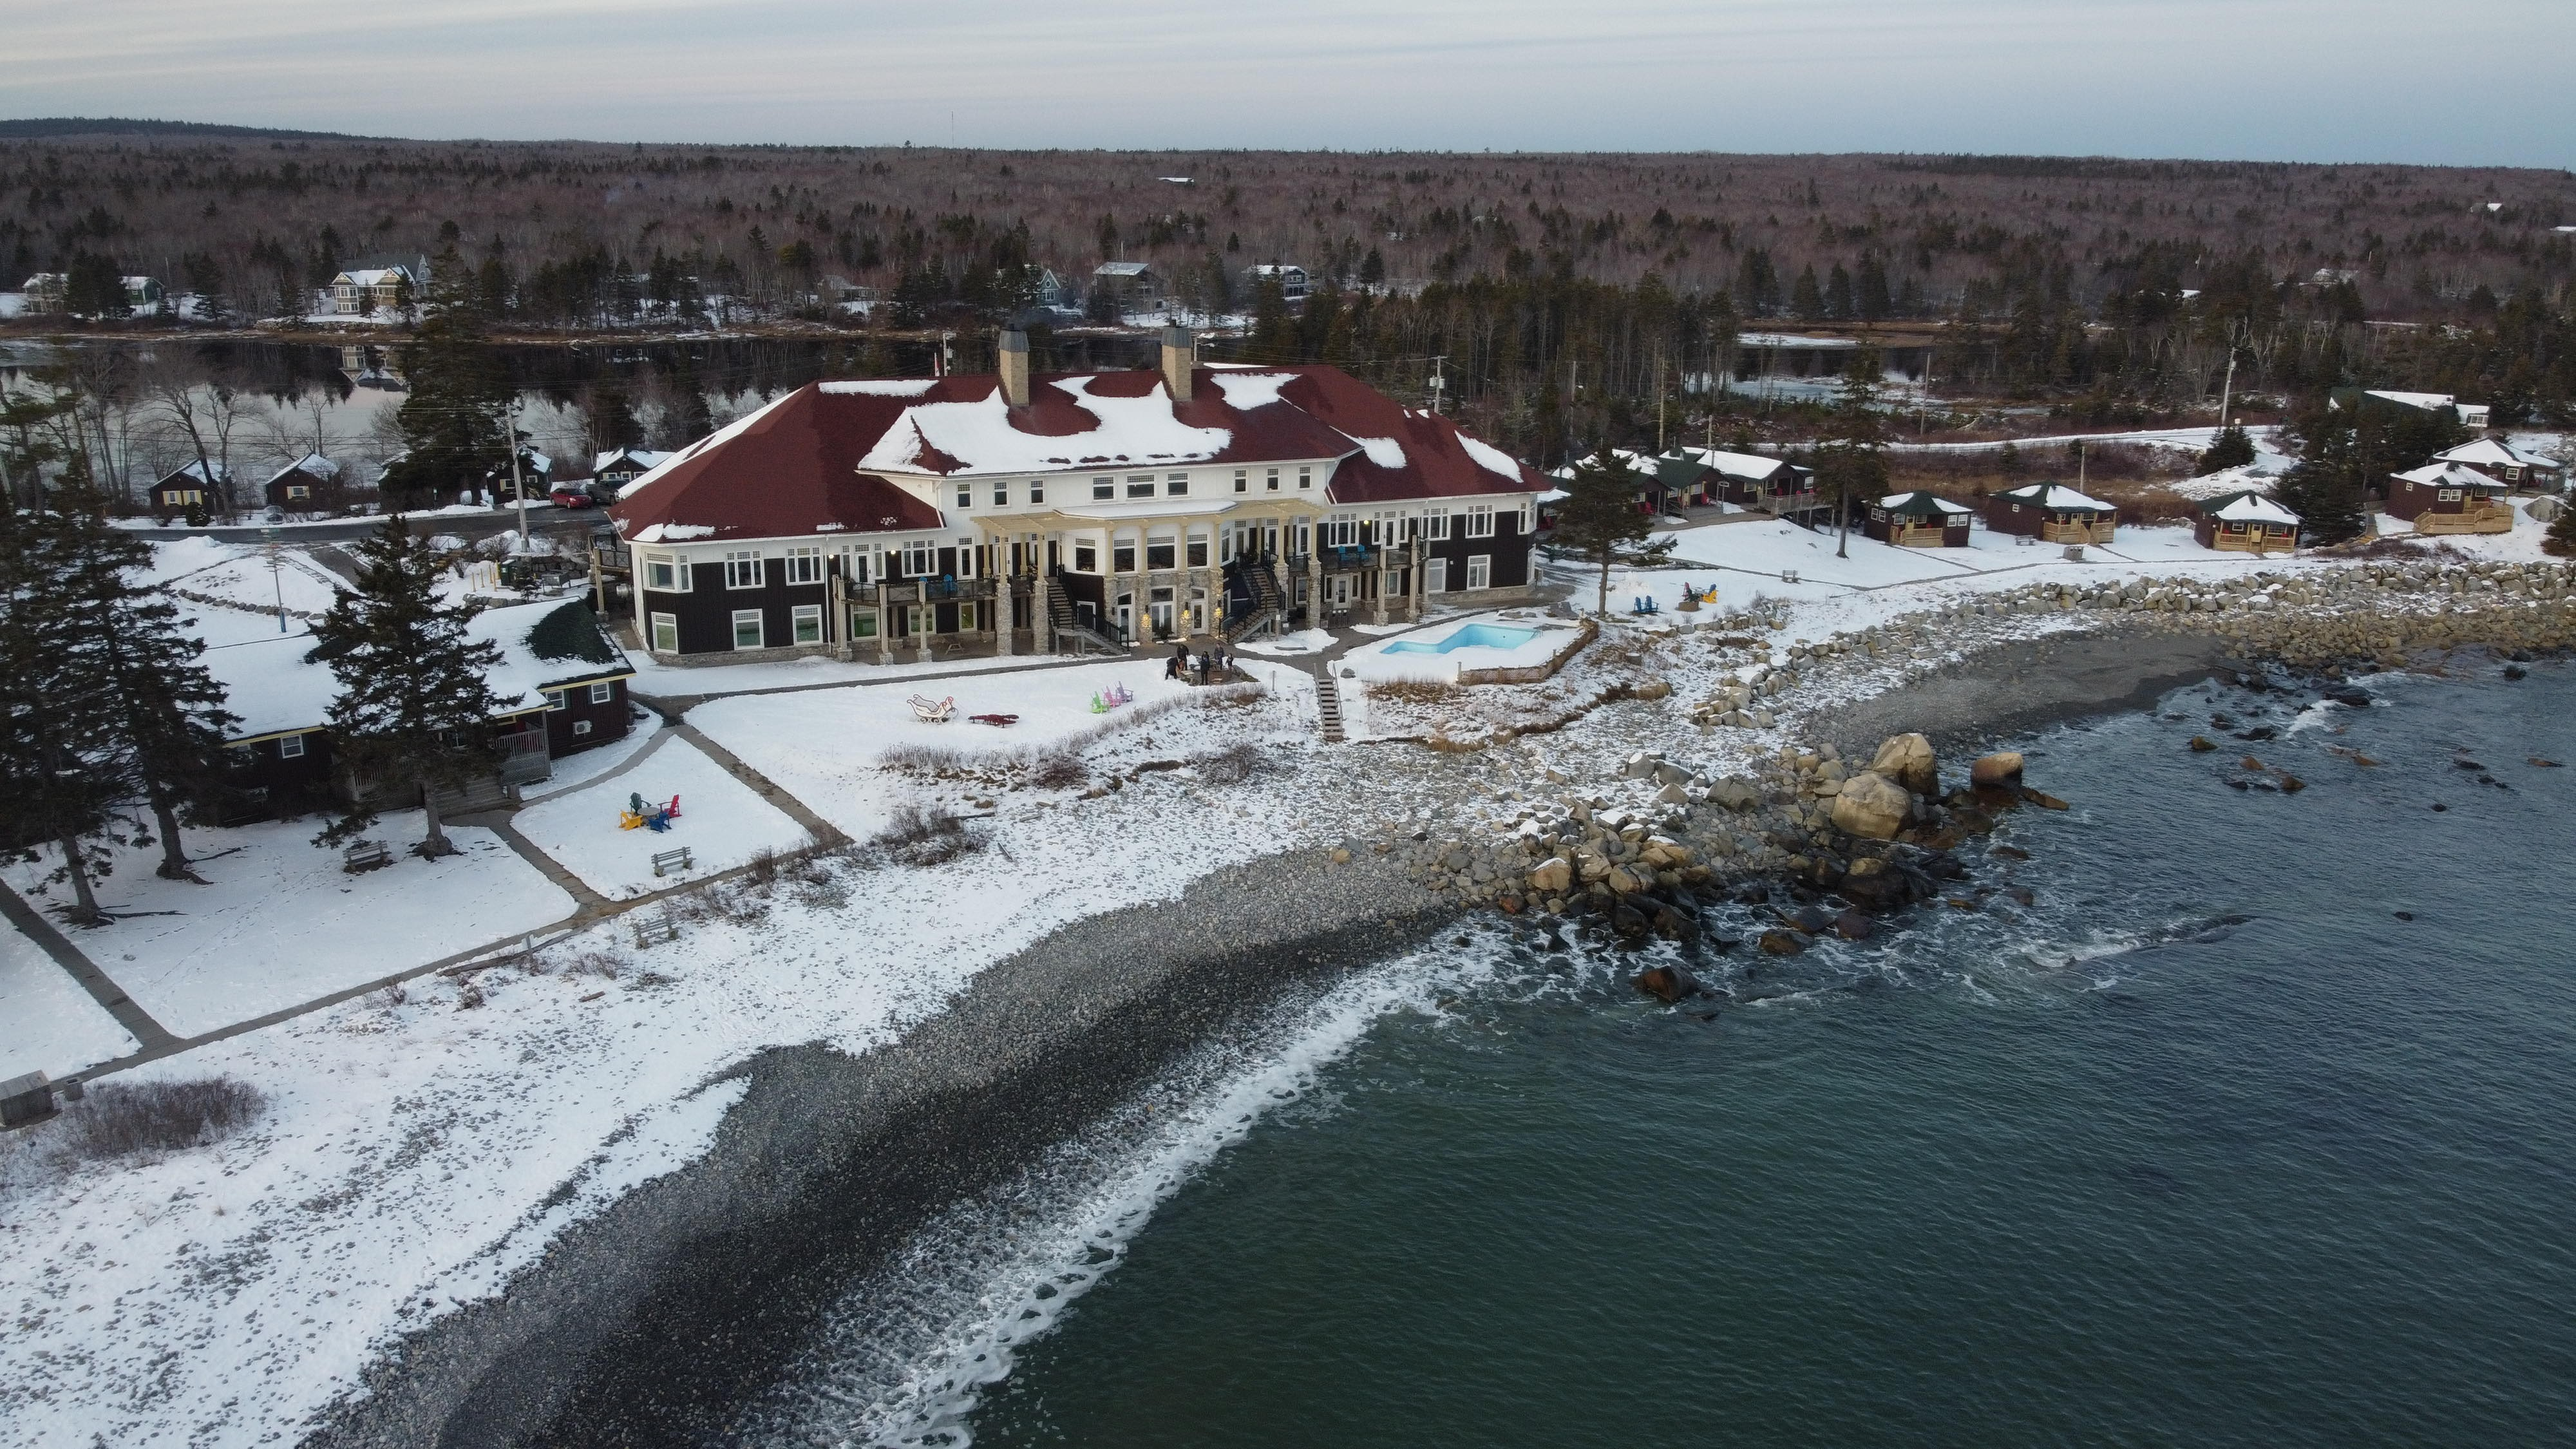 White Point Beach Resort Linkedin